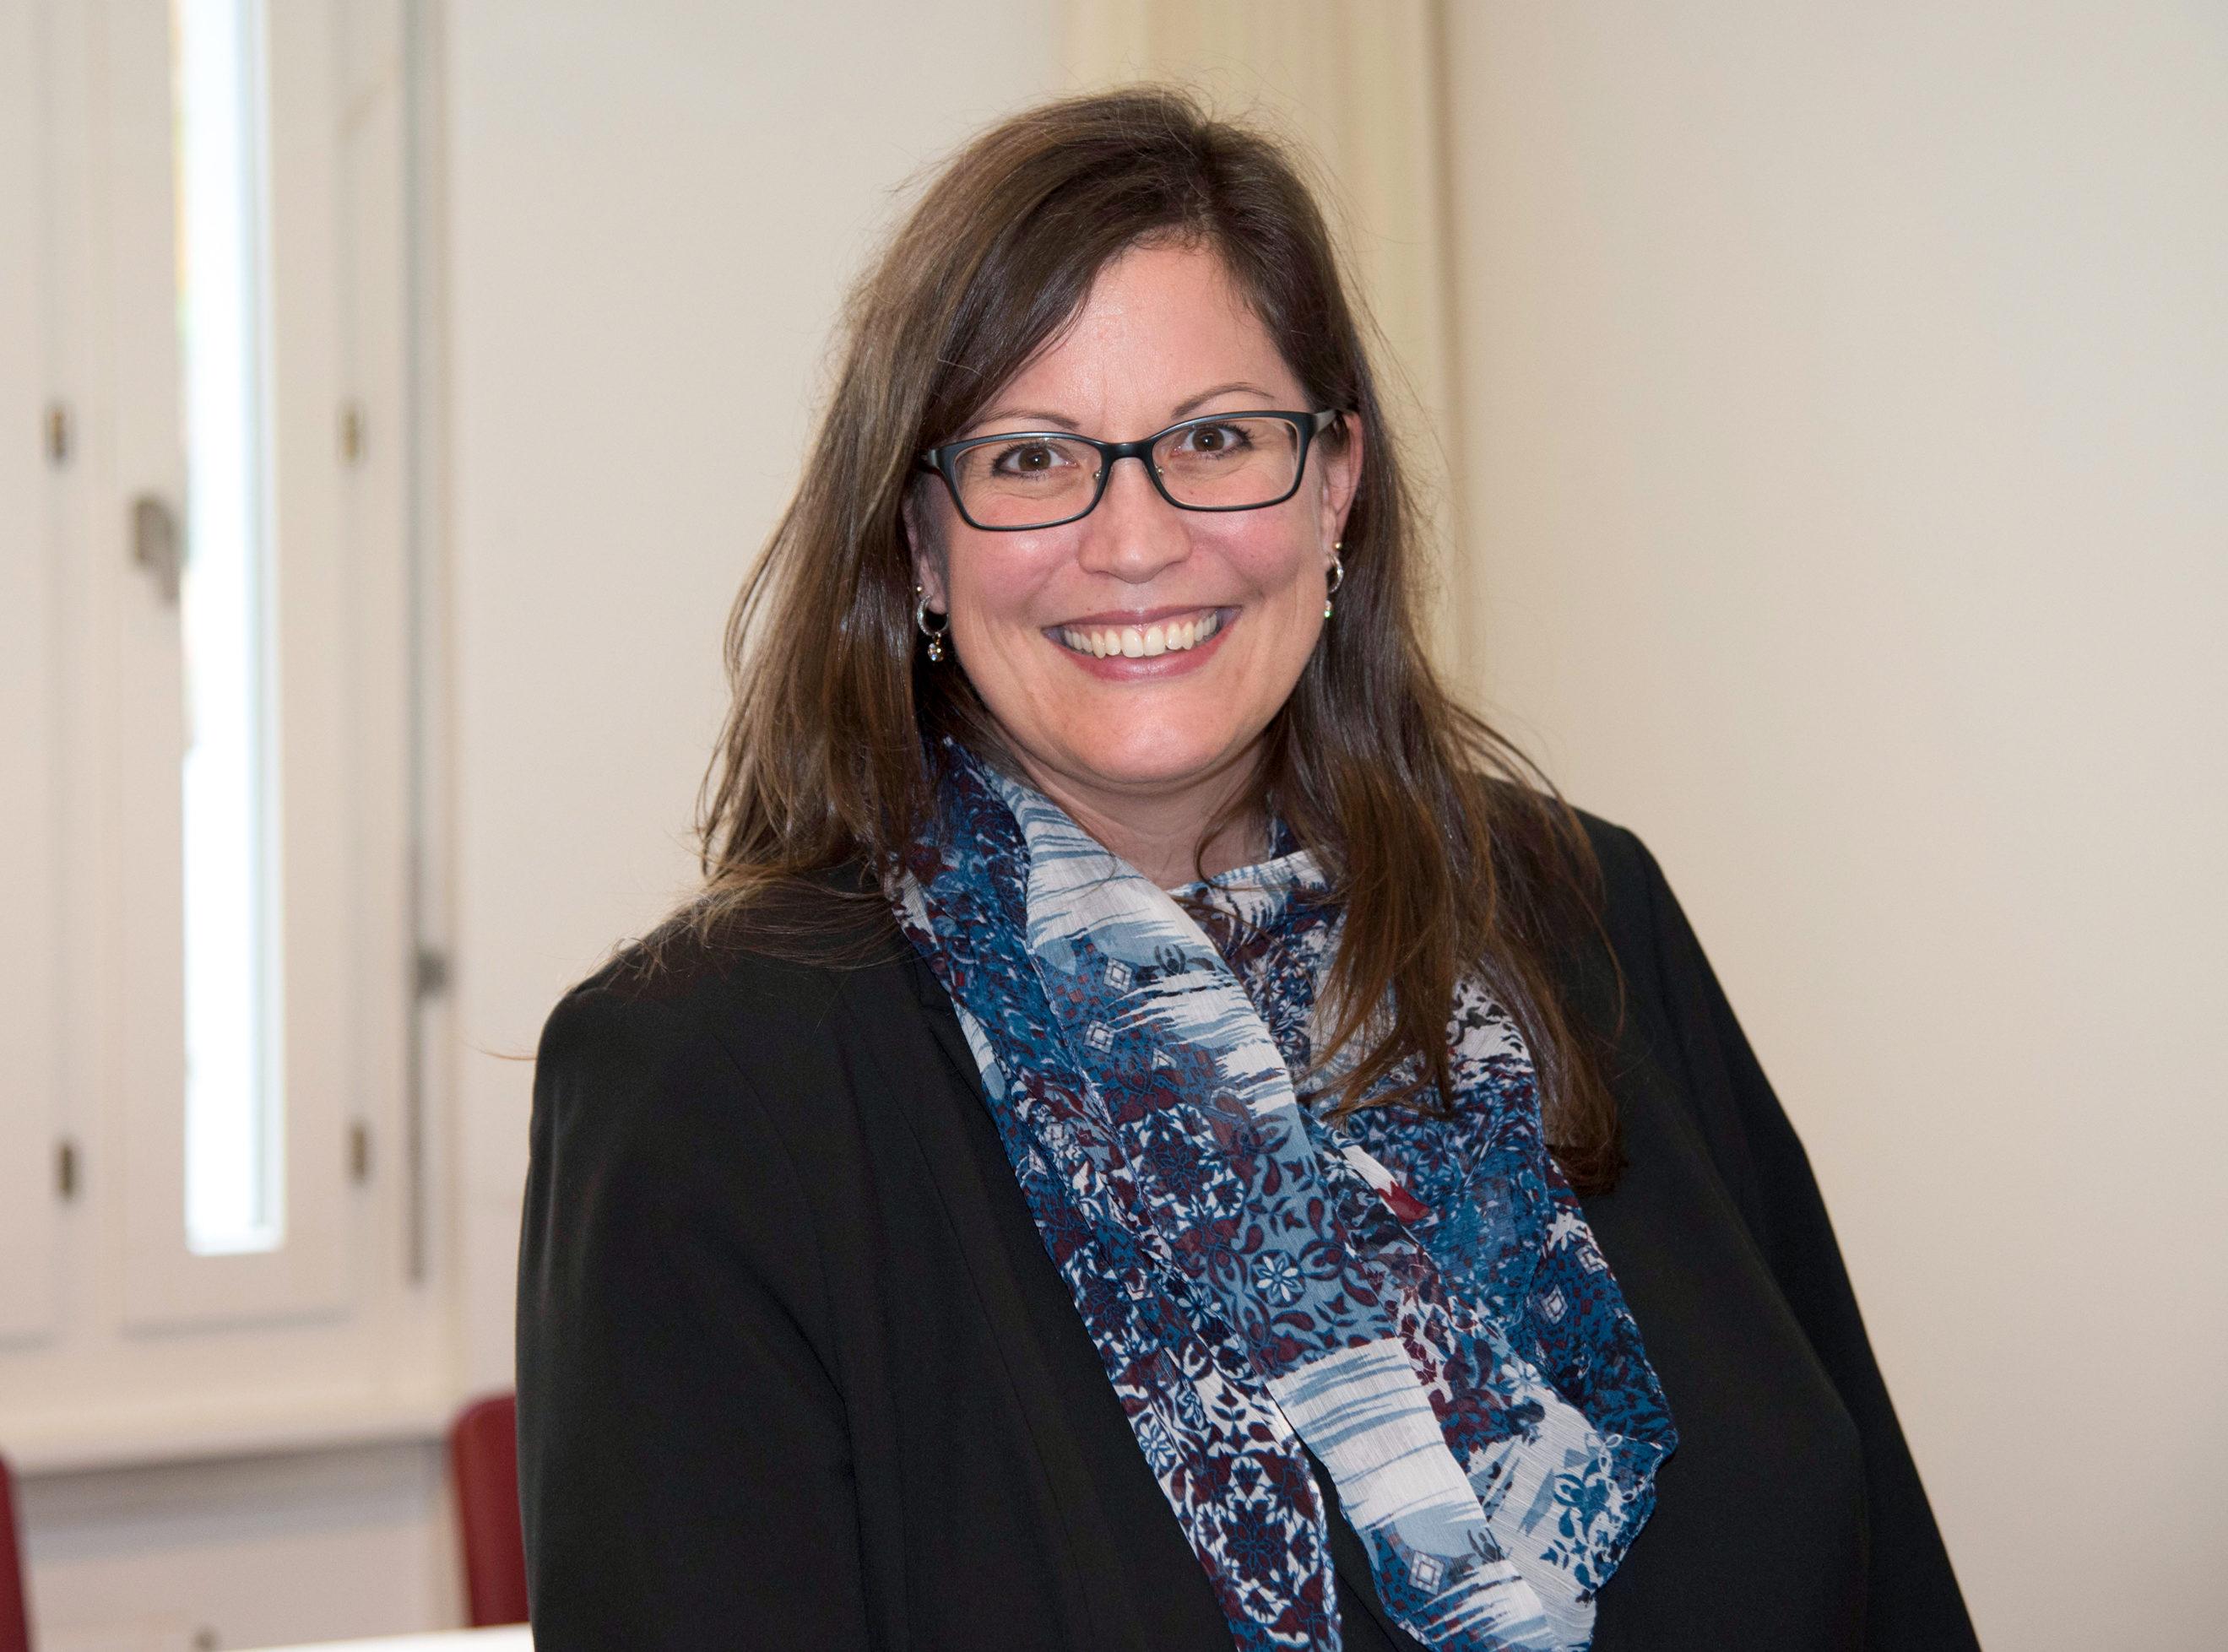 Pamela Wersin